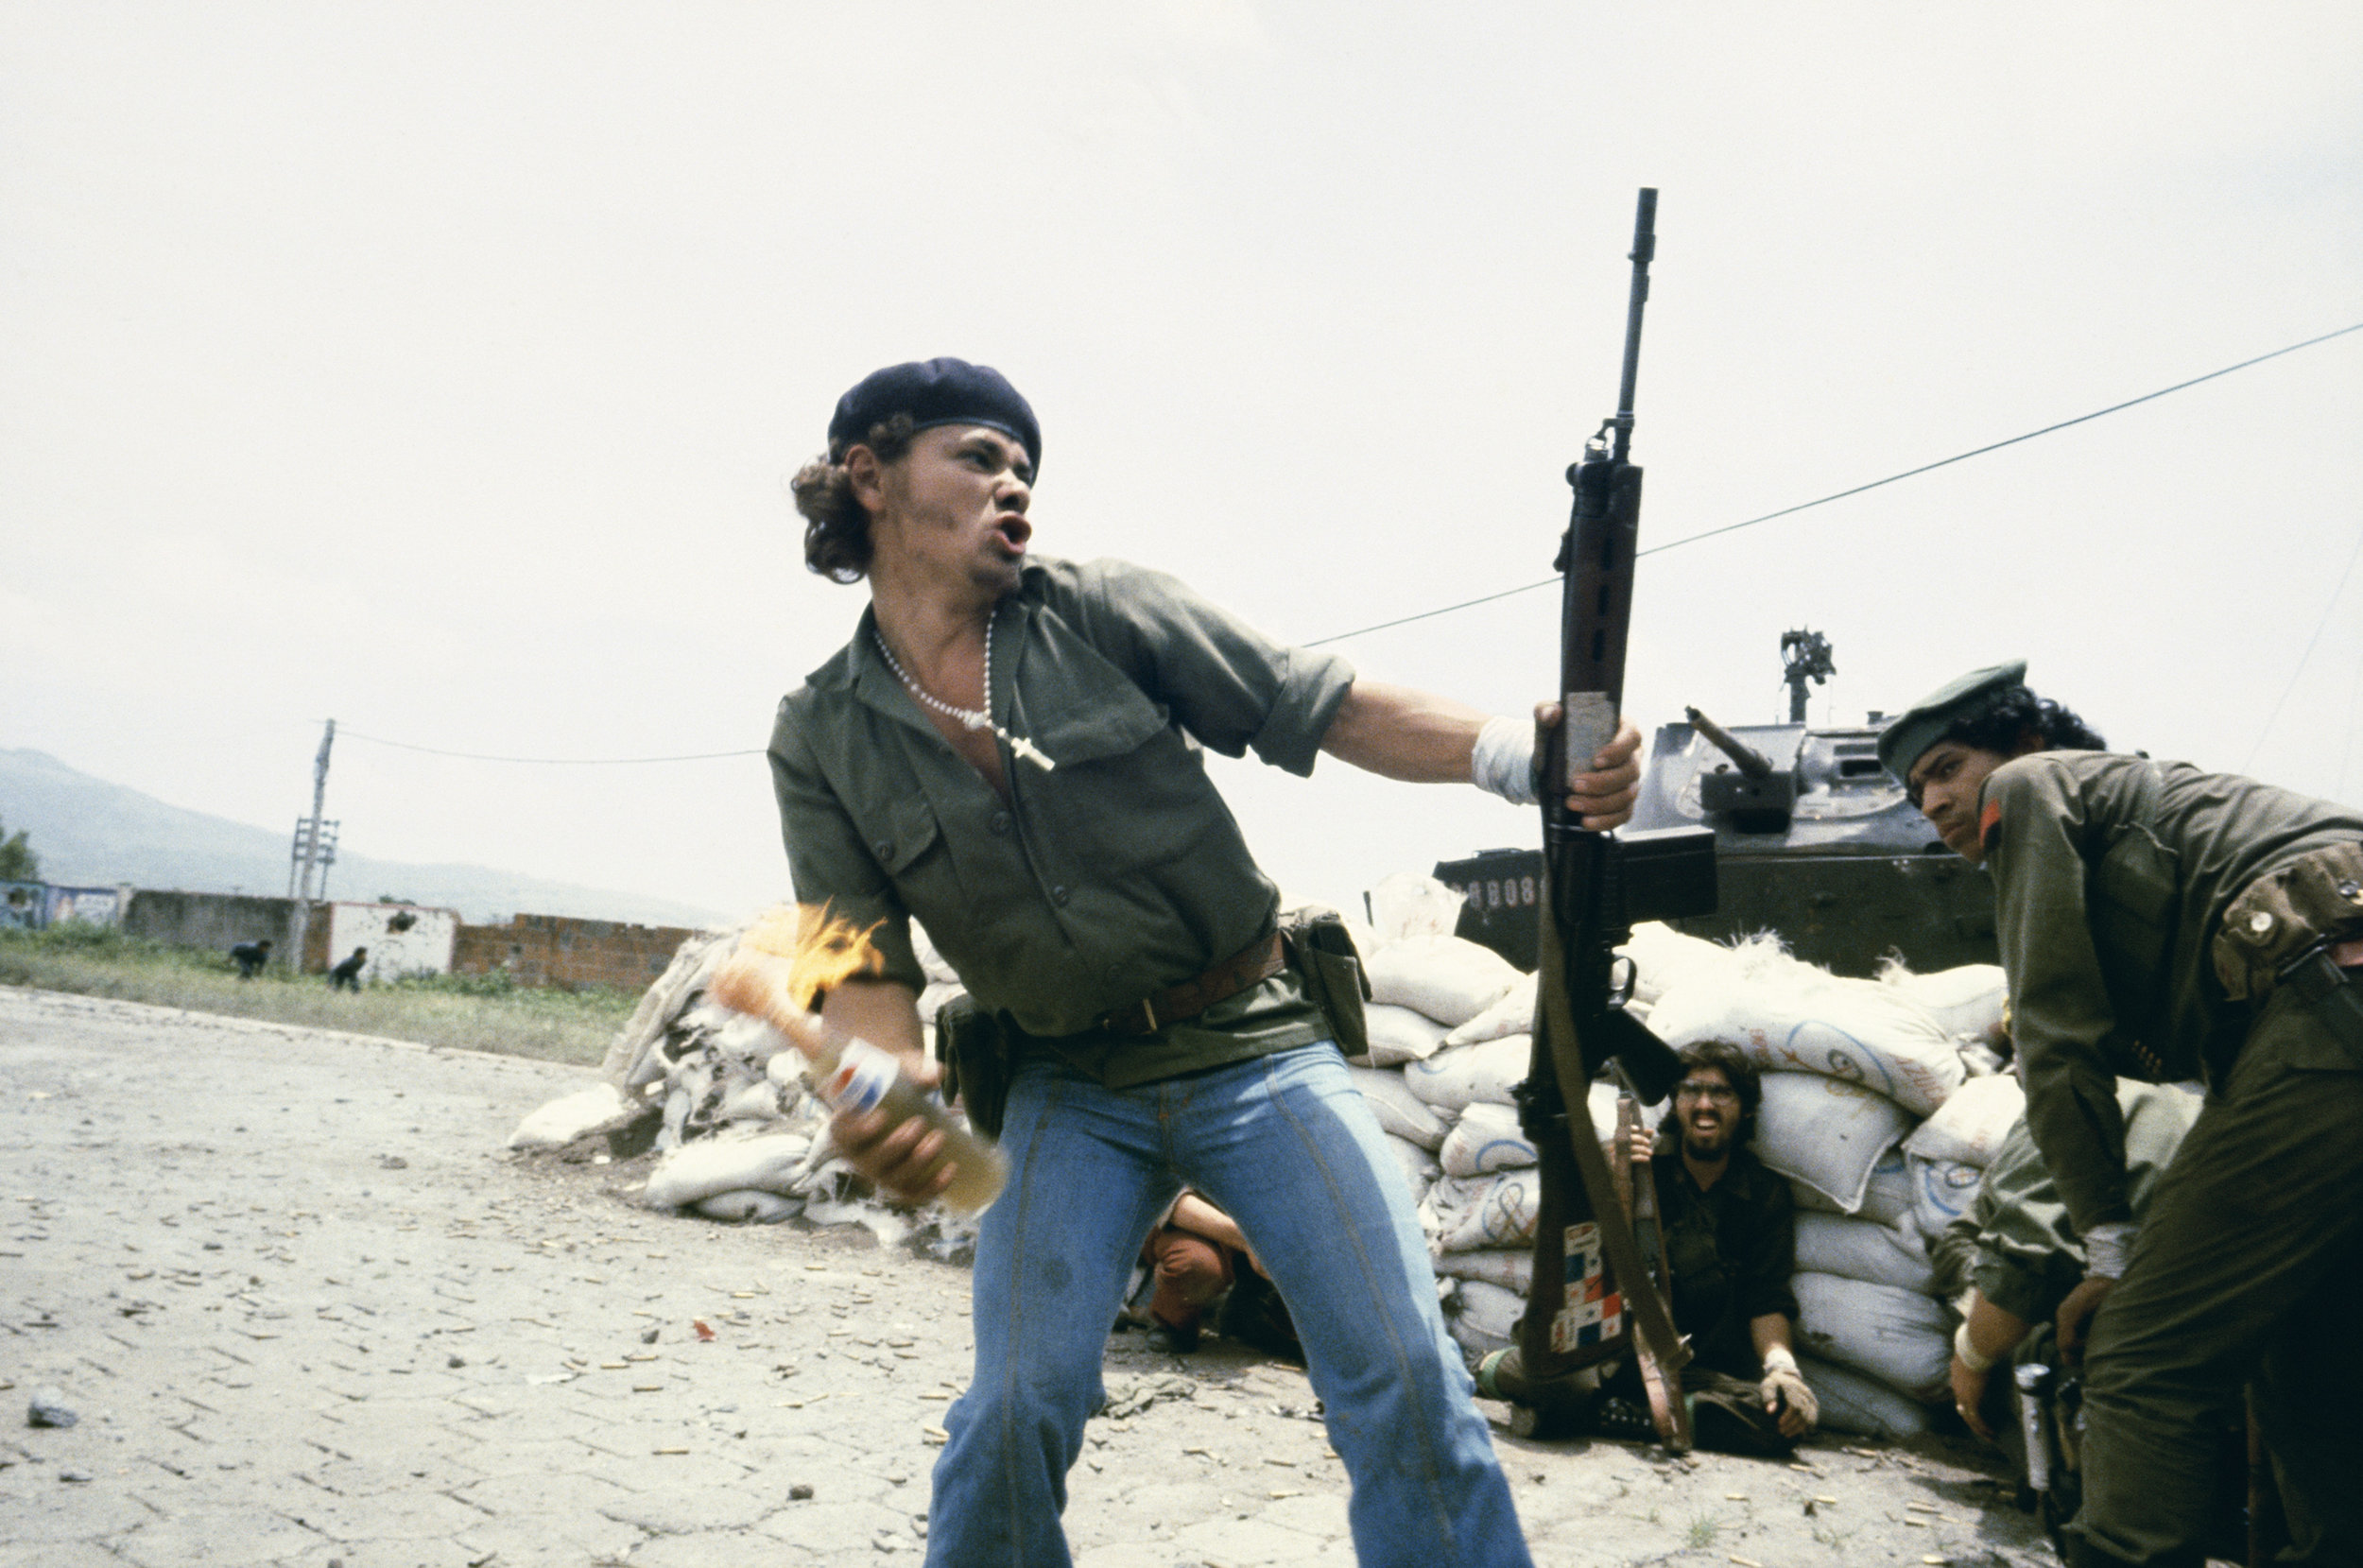 Sandinistas at the walls of the Esteli National Guard headquarters, Esteli, Nicaragua, 1979 © Susan Meiselas, 2018